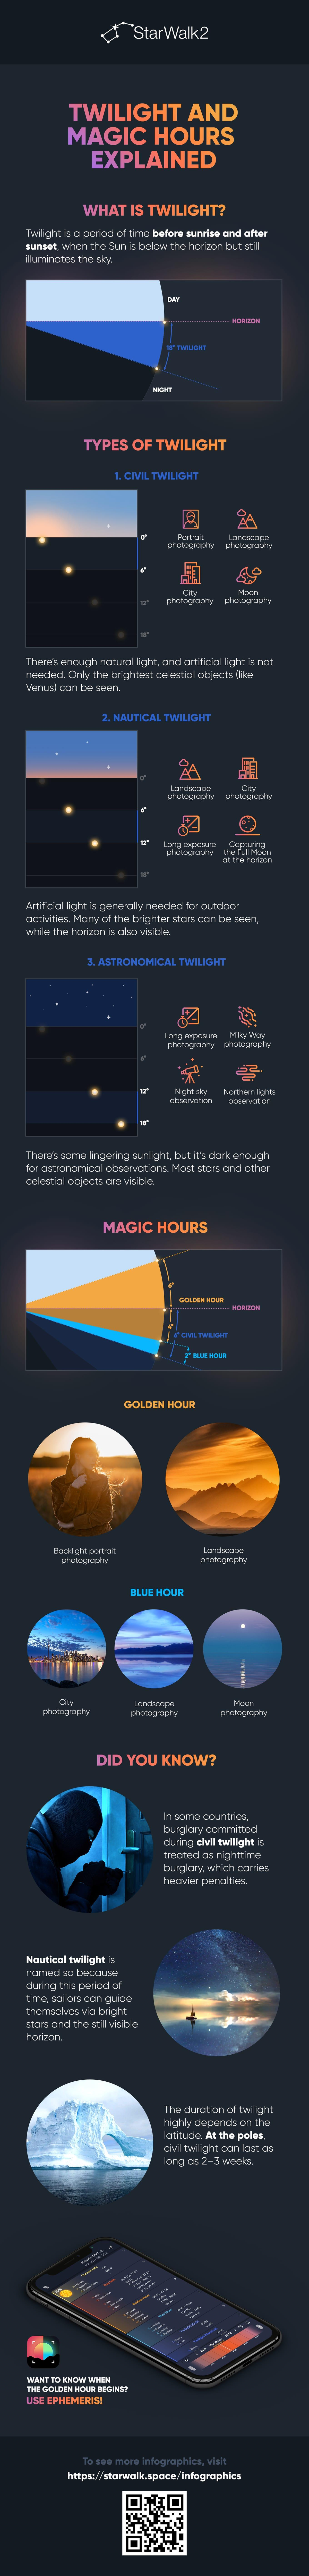 Twilight and Magic Hours Explained